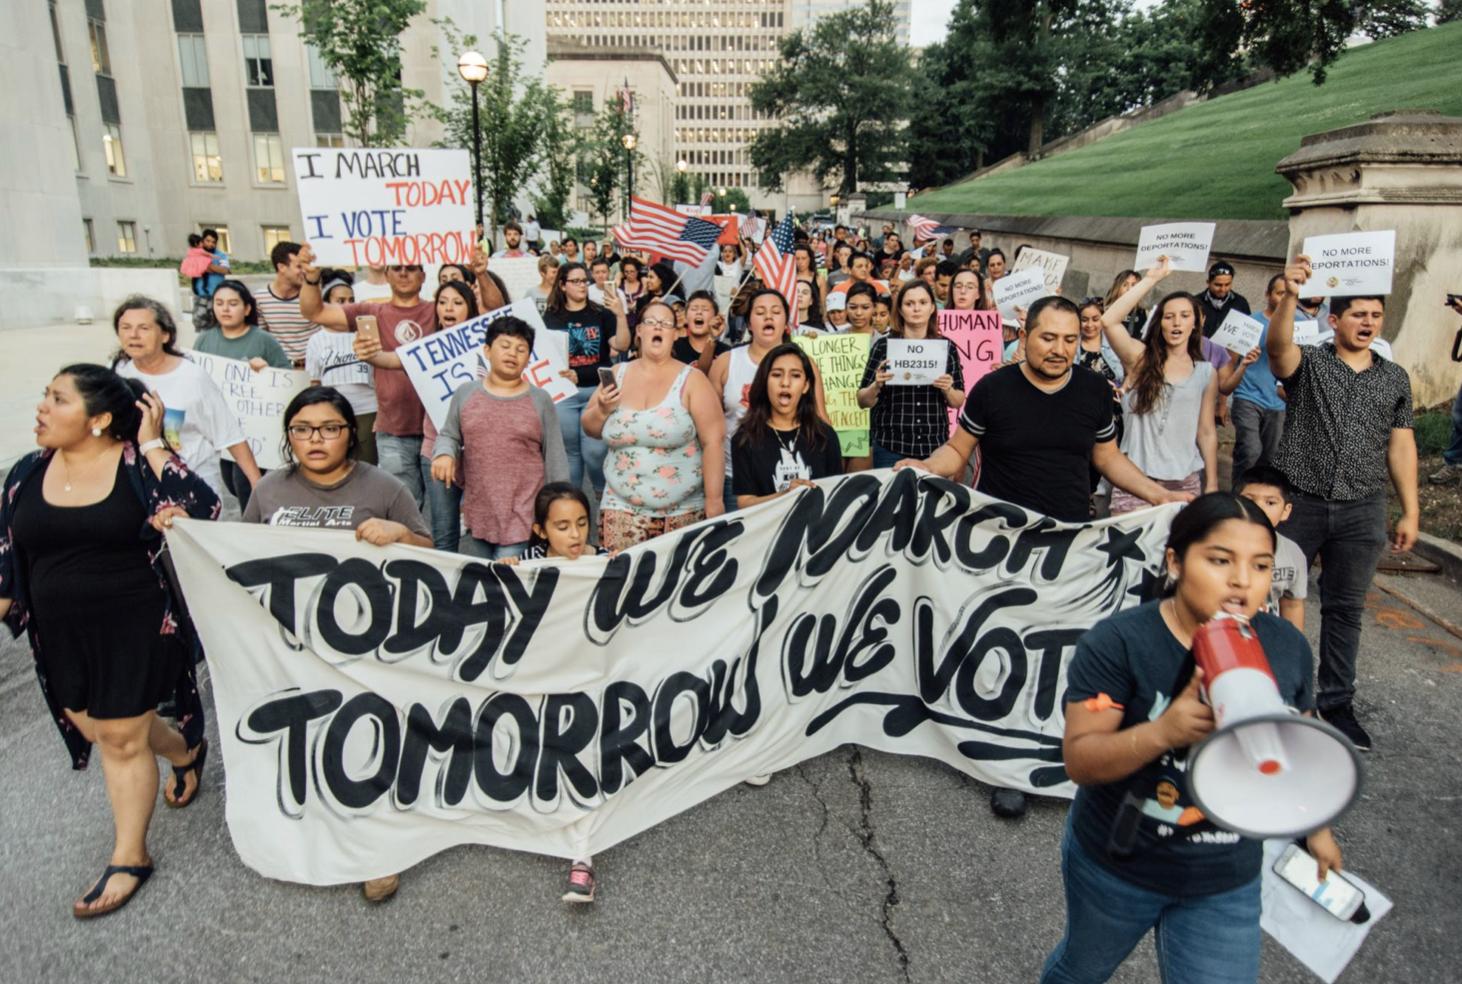 A 2018 photo from a TIRRC demonstration. (Photo: Jon Dragonette/TIRRC Facebook)